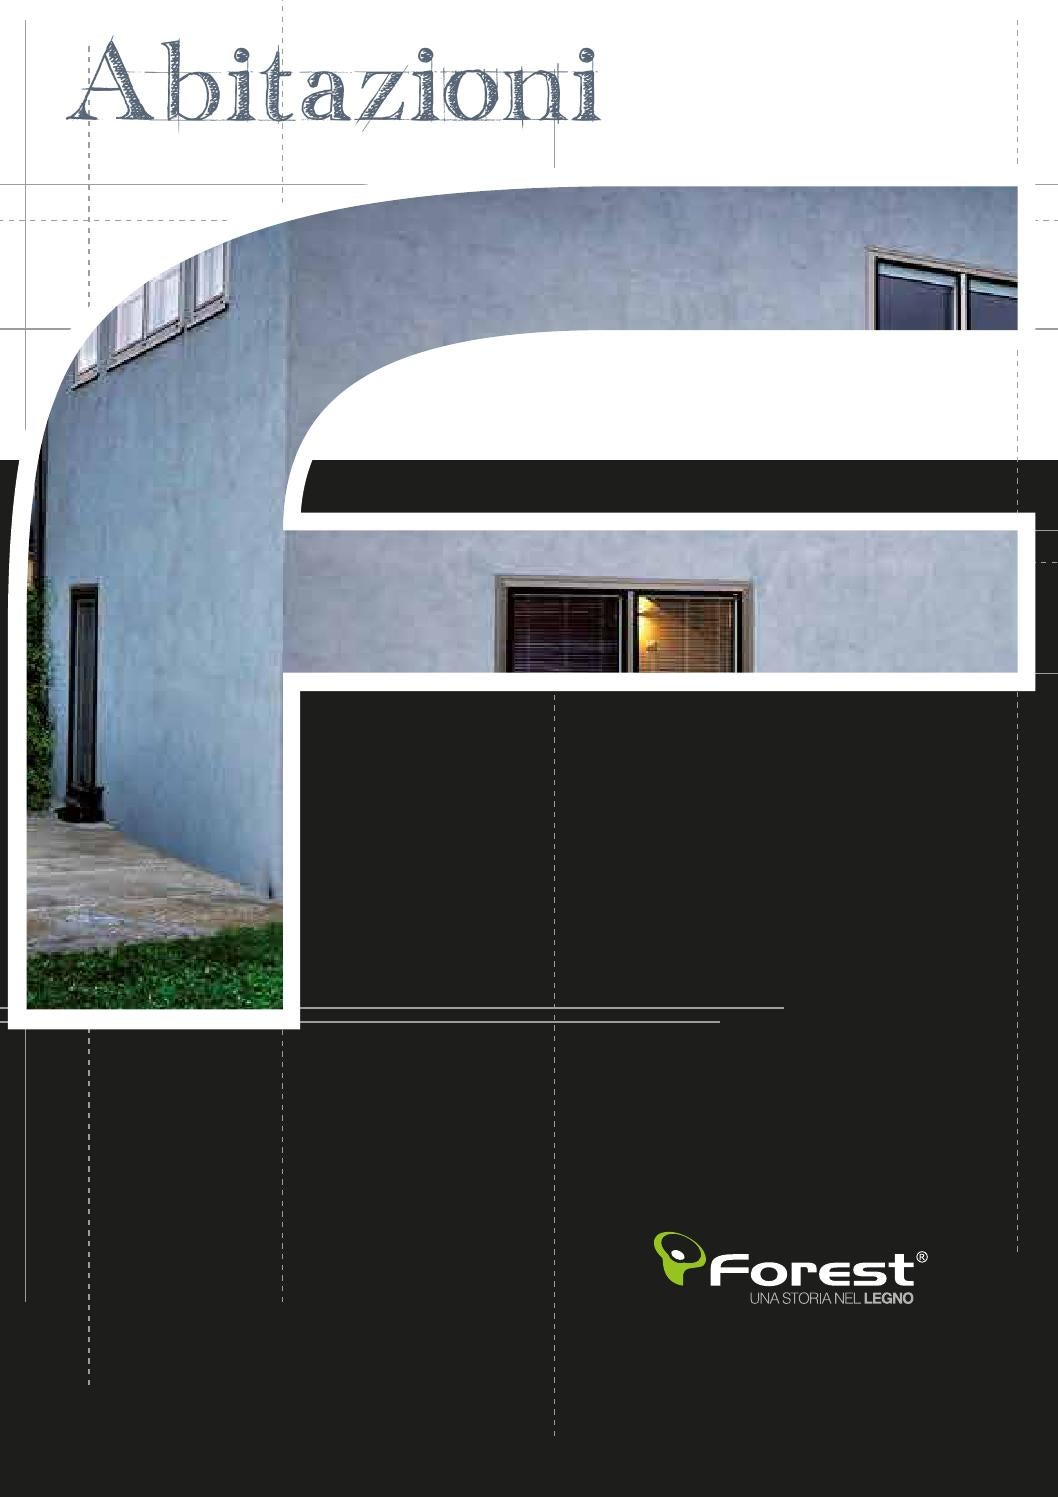 Gruppo forest catalogo abitazioni 2014 by massimo for Gruppo forest